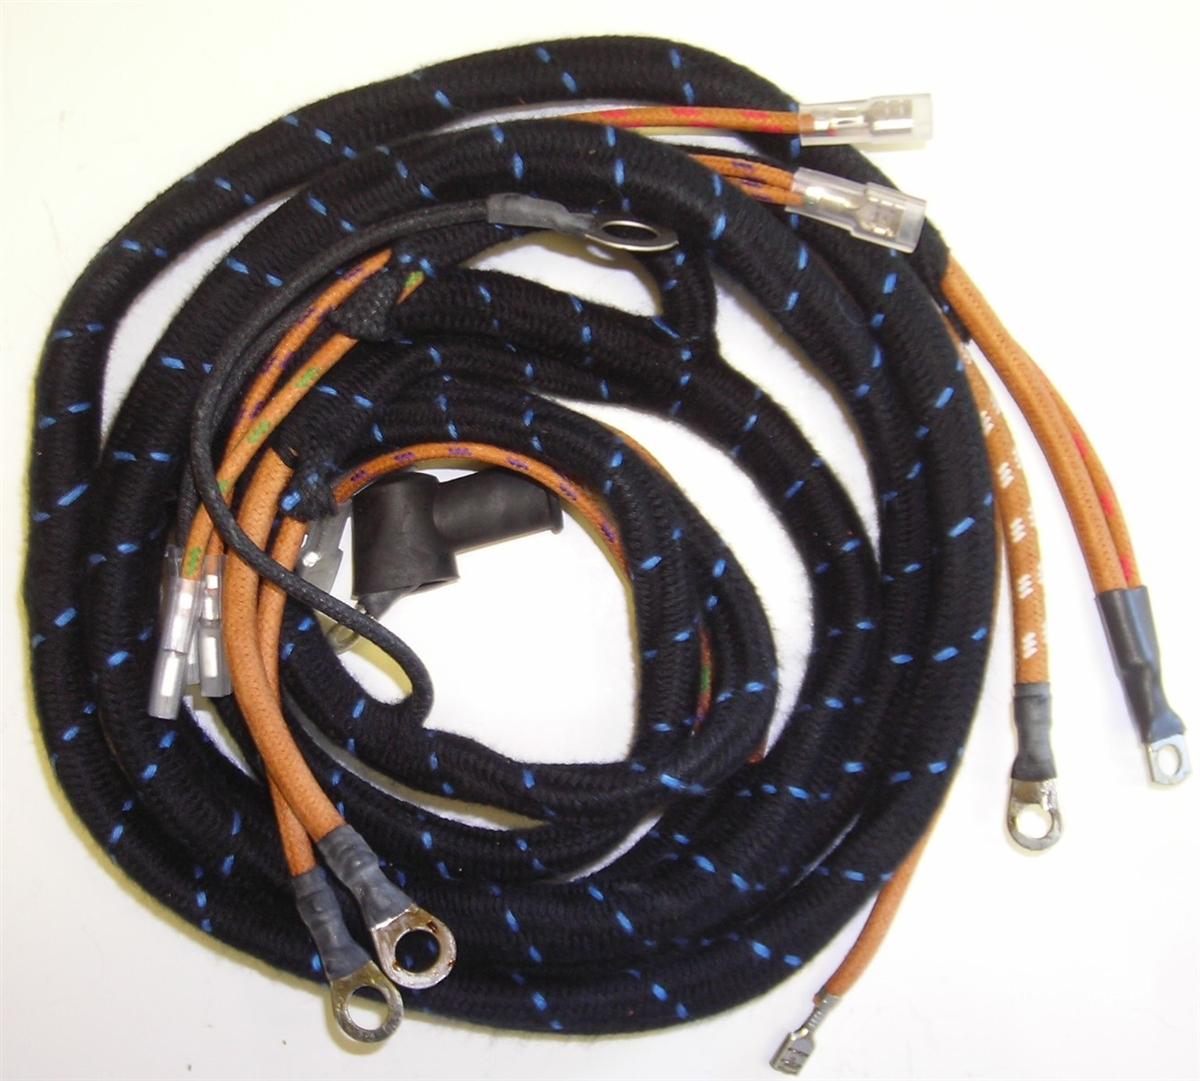 Jaguar Alternator Wiring Harness